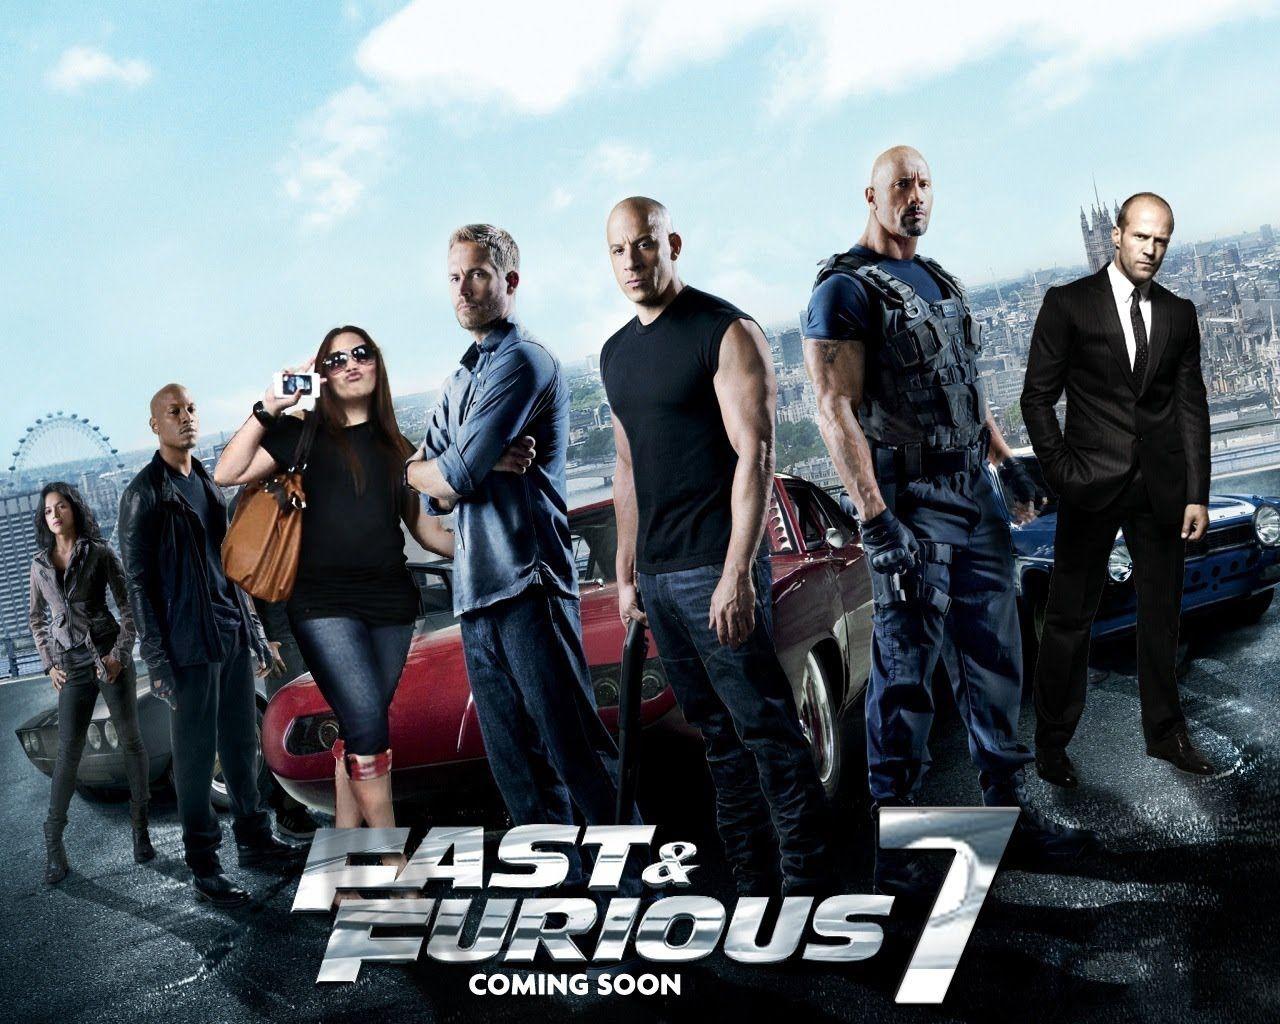 Pin By Ubaithullah Ubaithullah On Harry Furious 7 Movie Movie Fast And Furious Download Movies